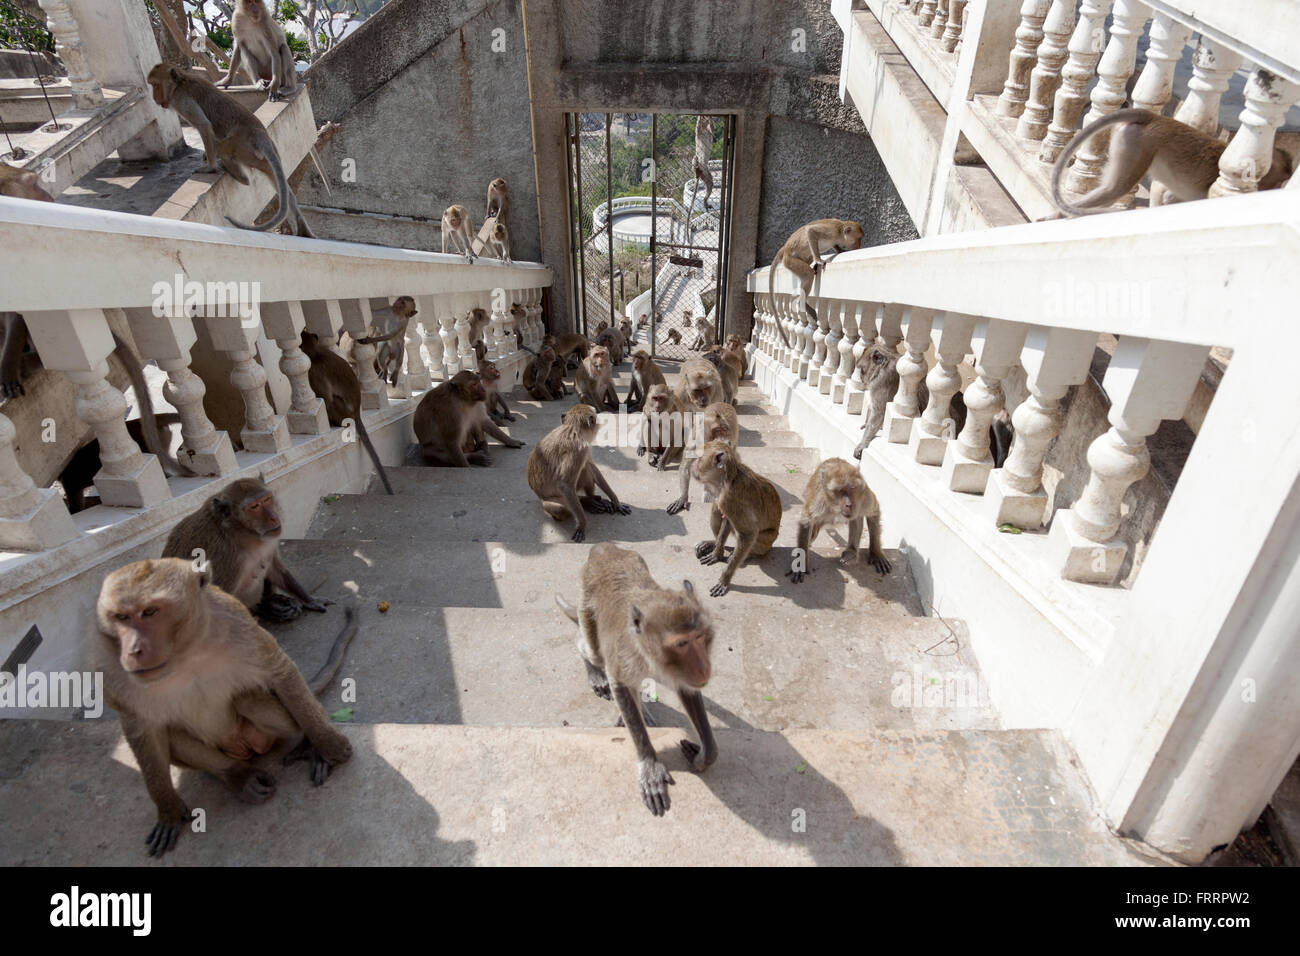 Hordes of monkeys dashing up the Thammikaram upstairs (Thailand). Macaques se ruant en haut de l'escalier du - Stock Image